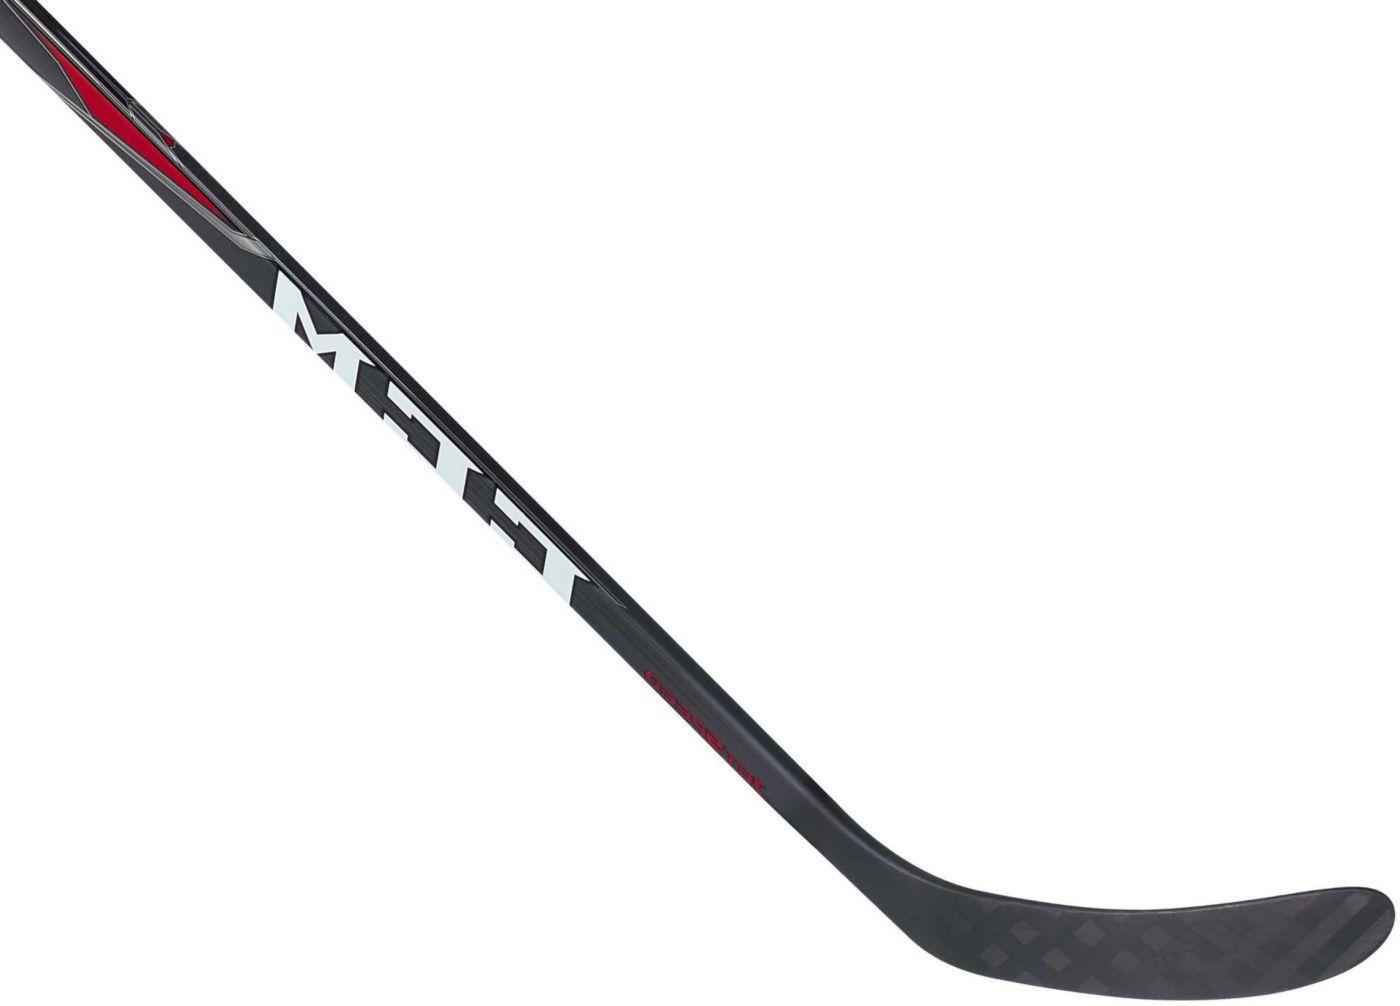 CCM Senior Jetspeed 370 Ice Hockey Stick